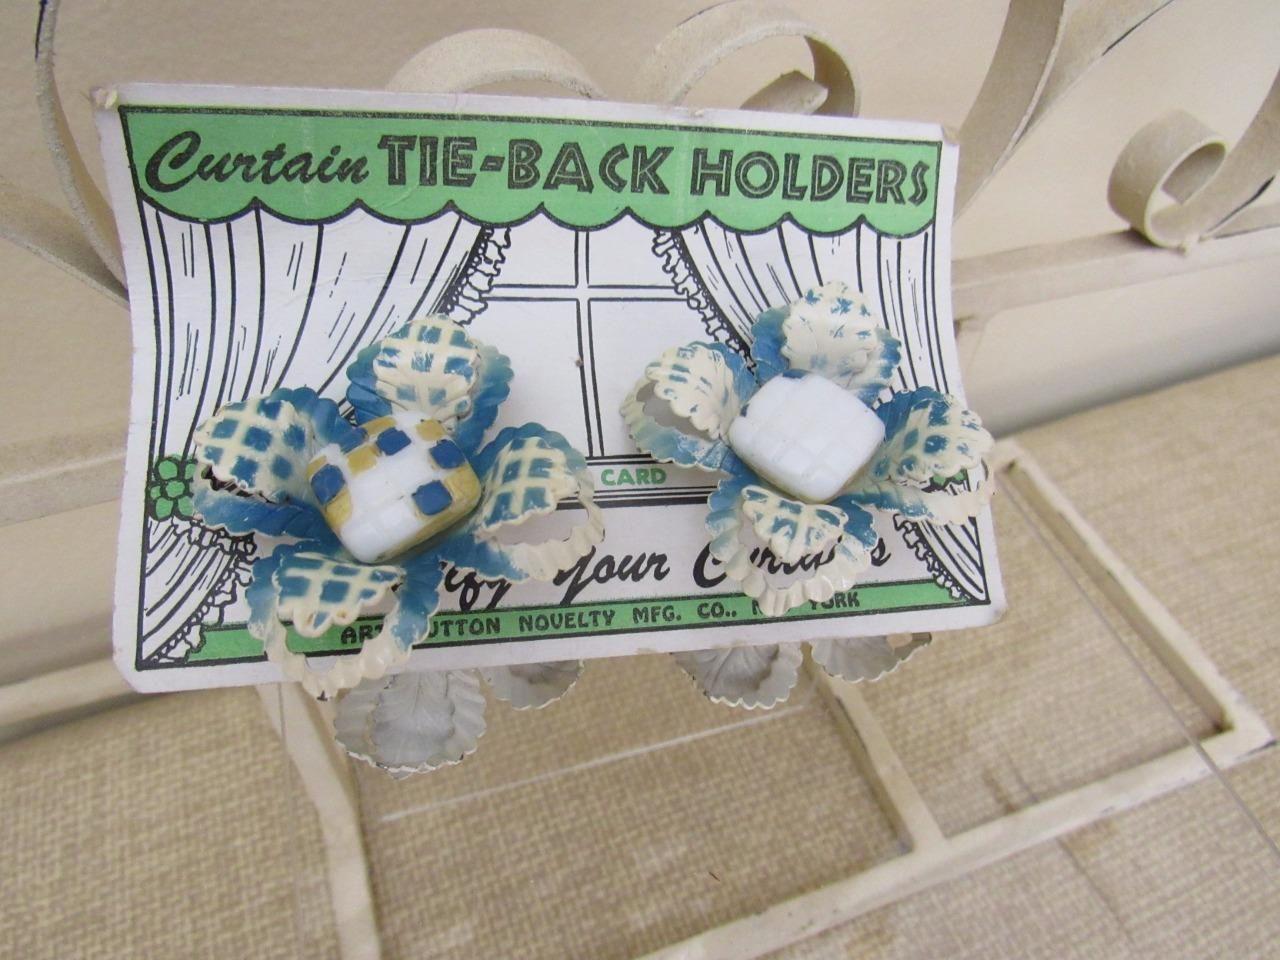 4 Vtg 1950s BLUE & CREAM Floral Curtain Tie Back Holders Enameled ...